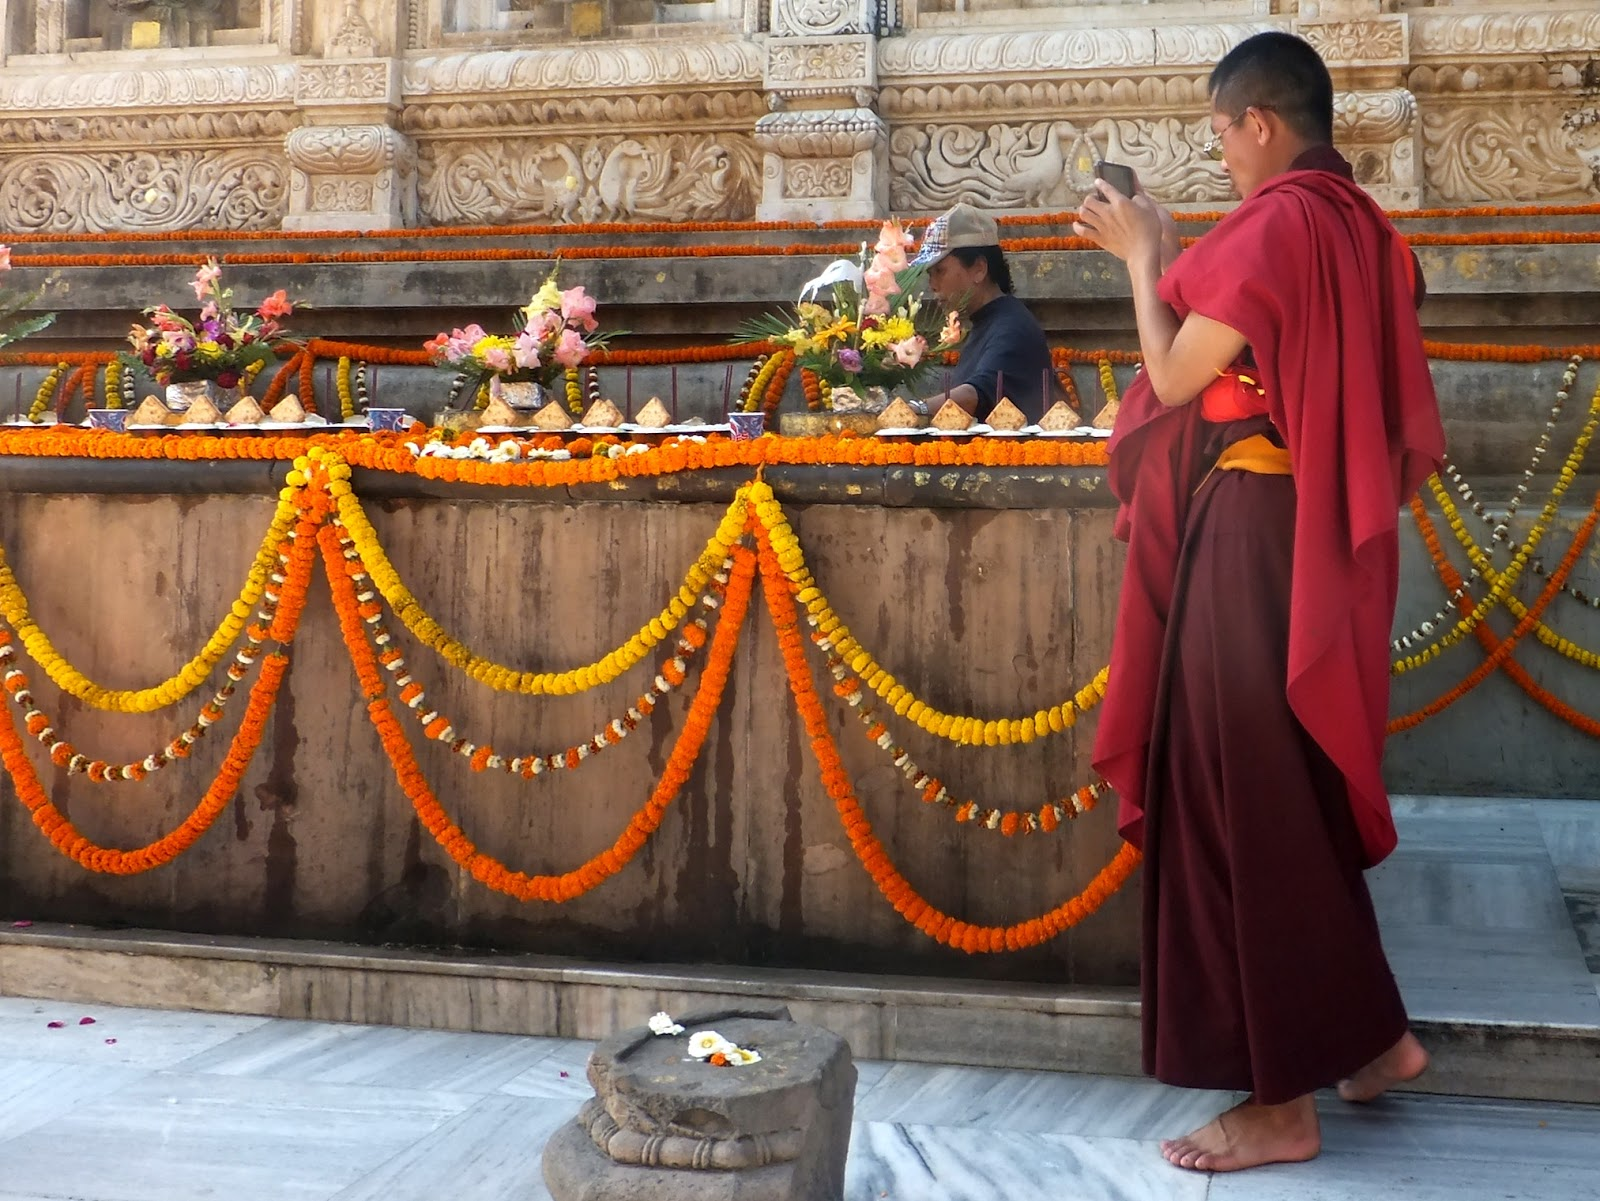 буддисткий монах со смартфоном